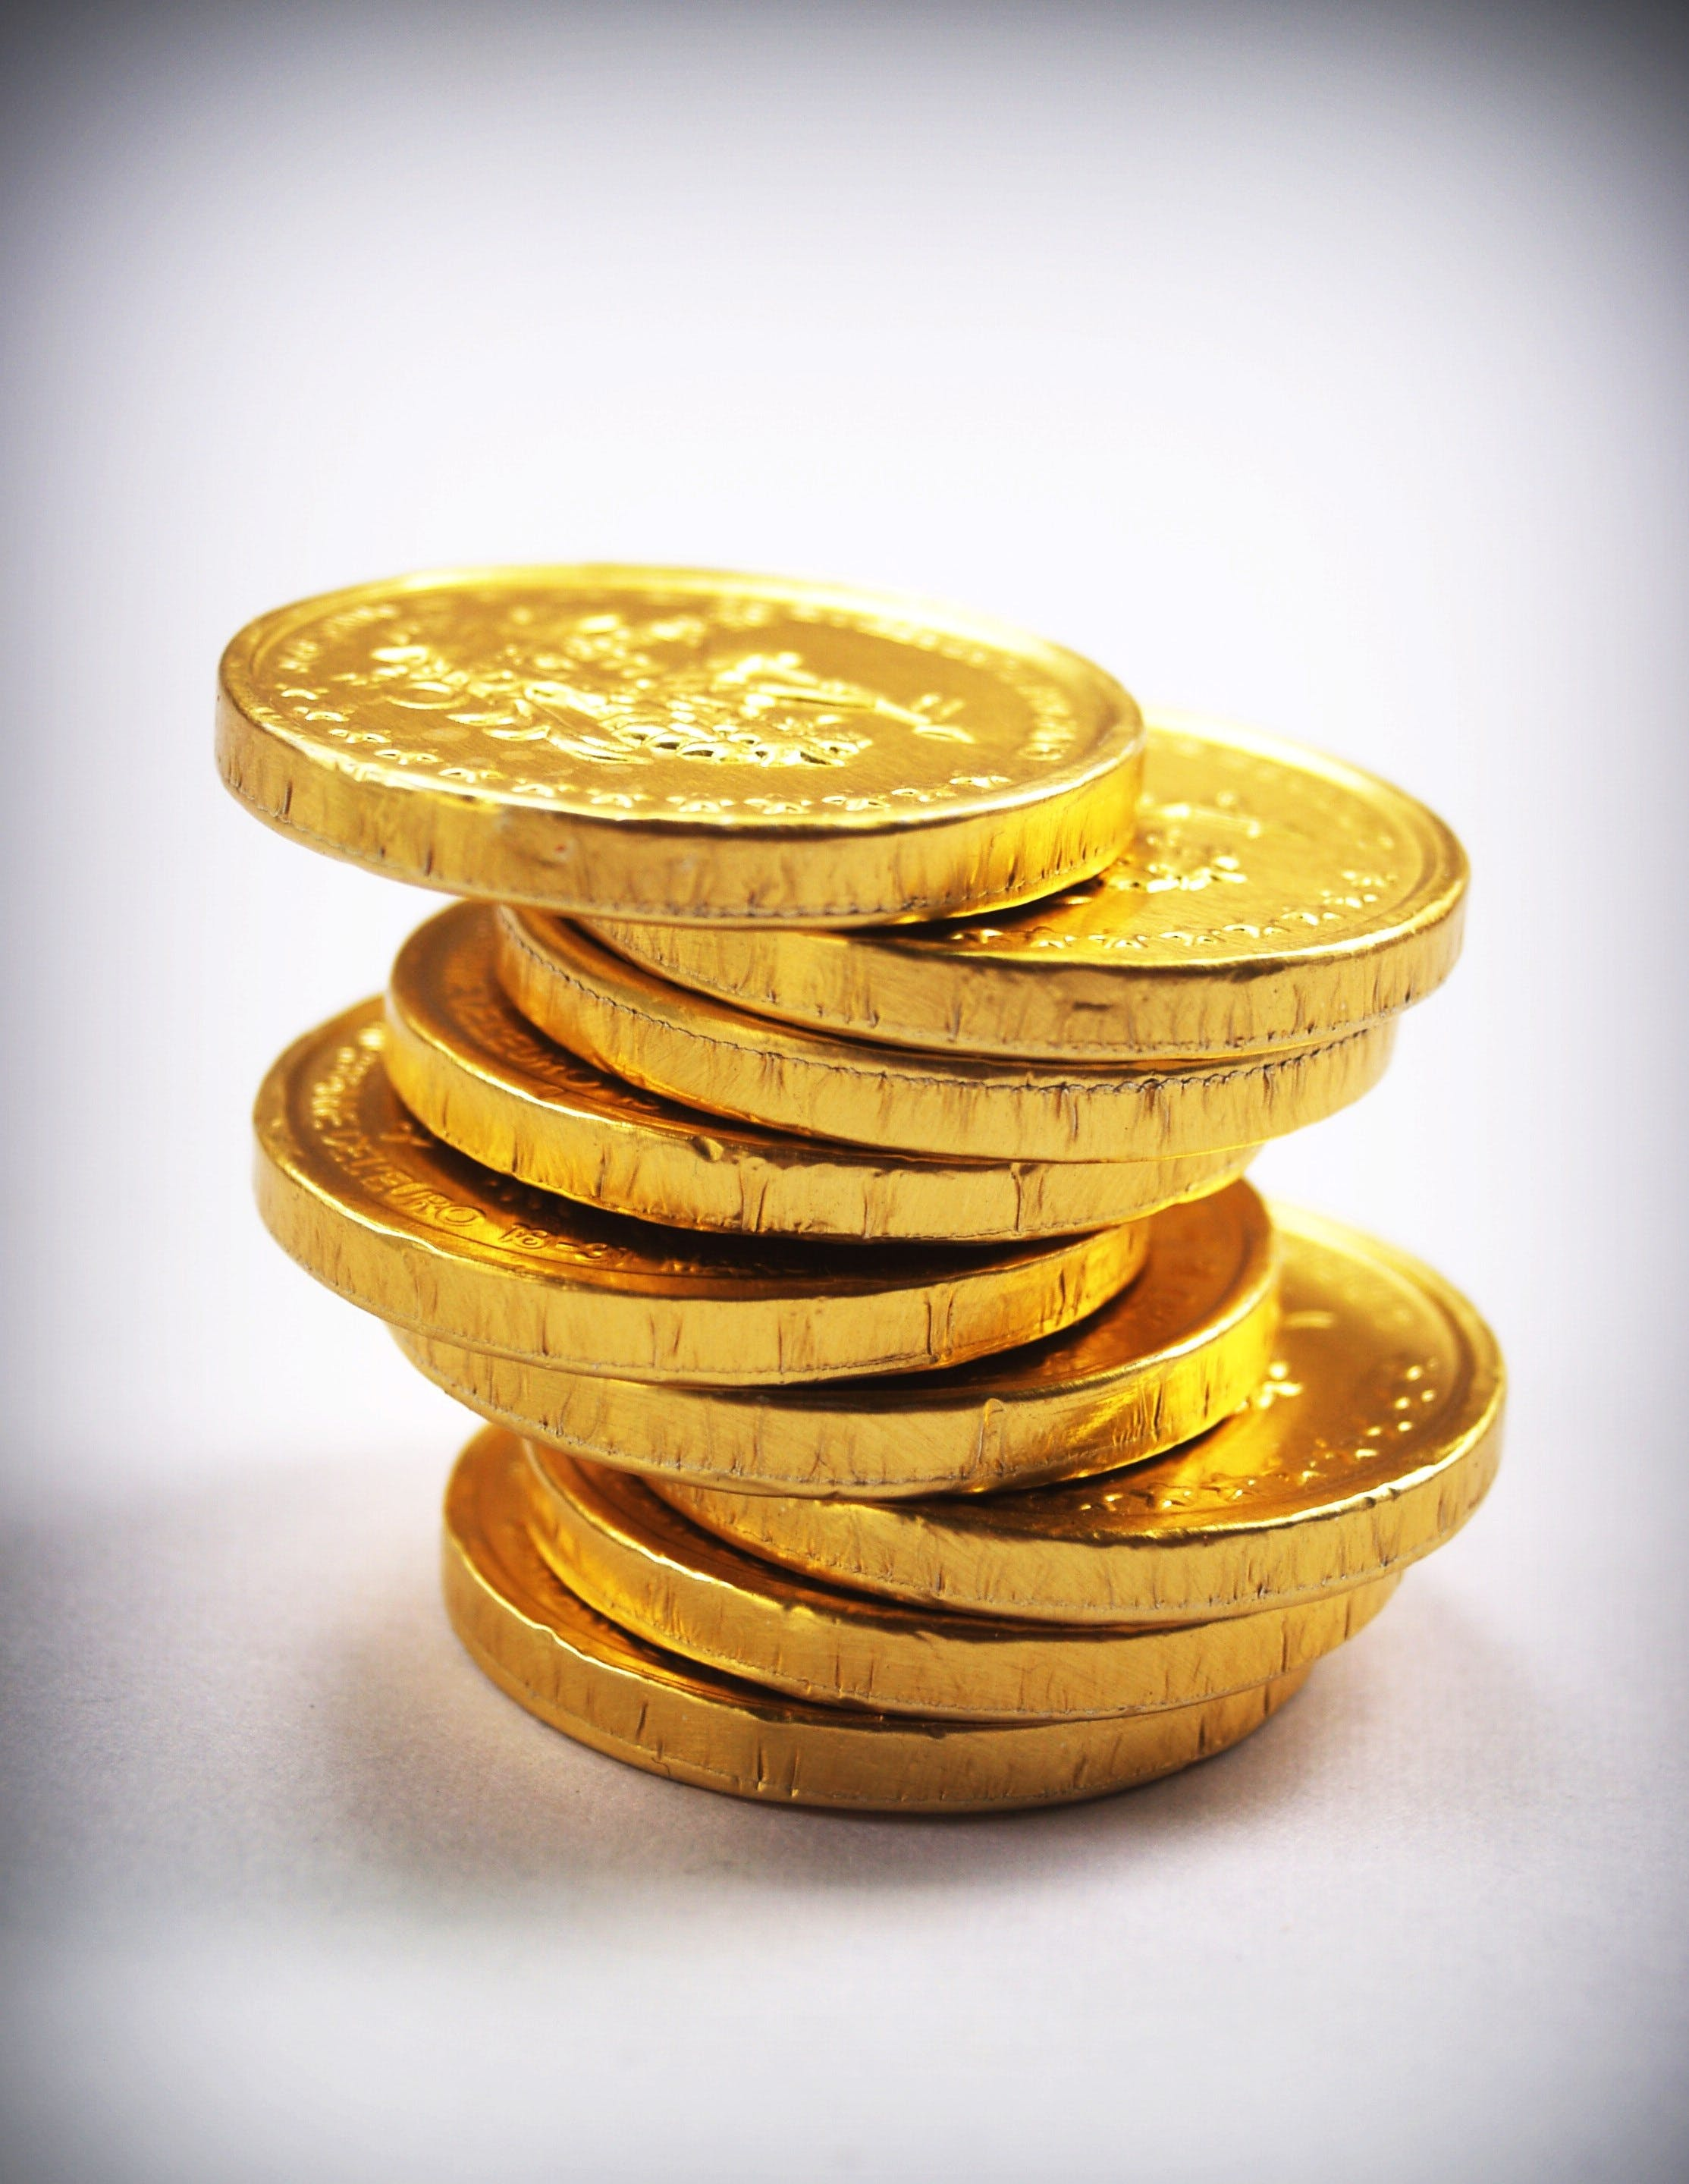 9 Piece of Gold Round Case of Chocolates